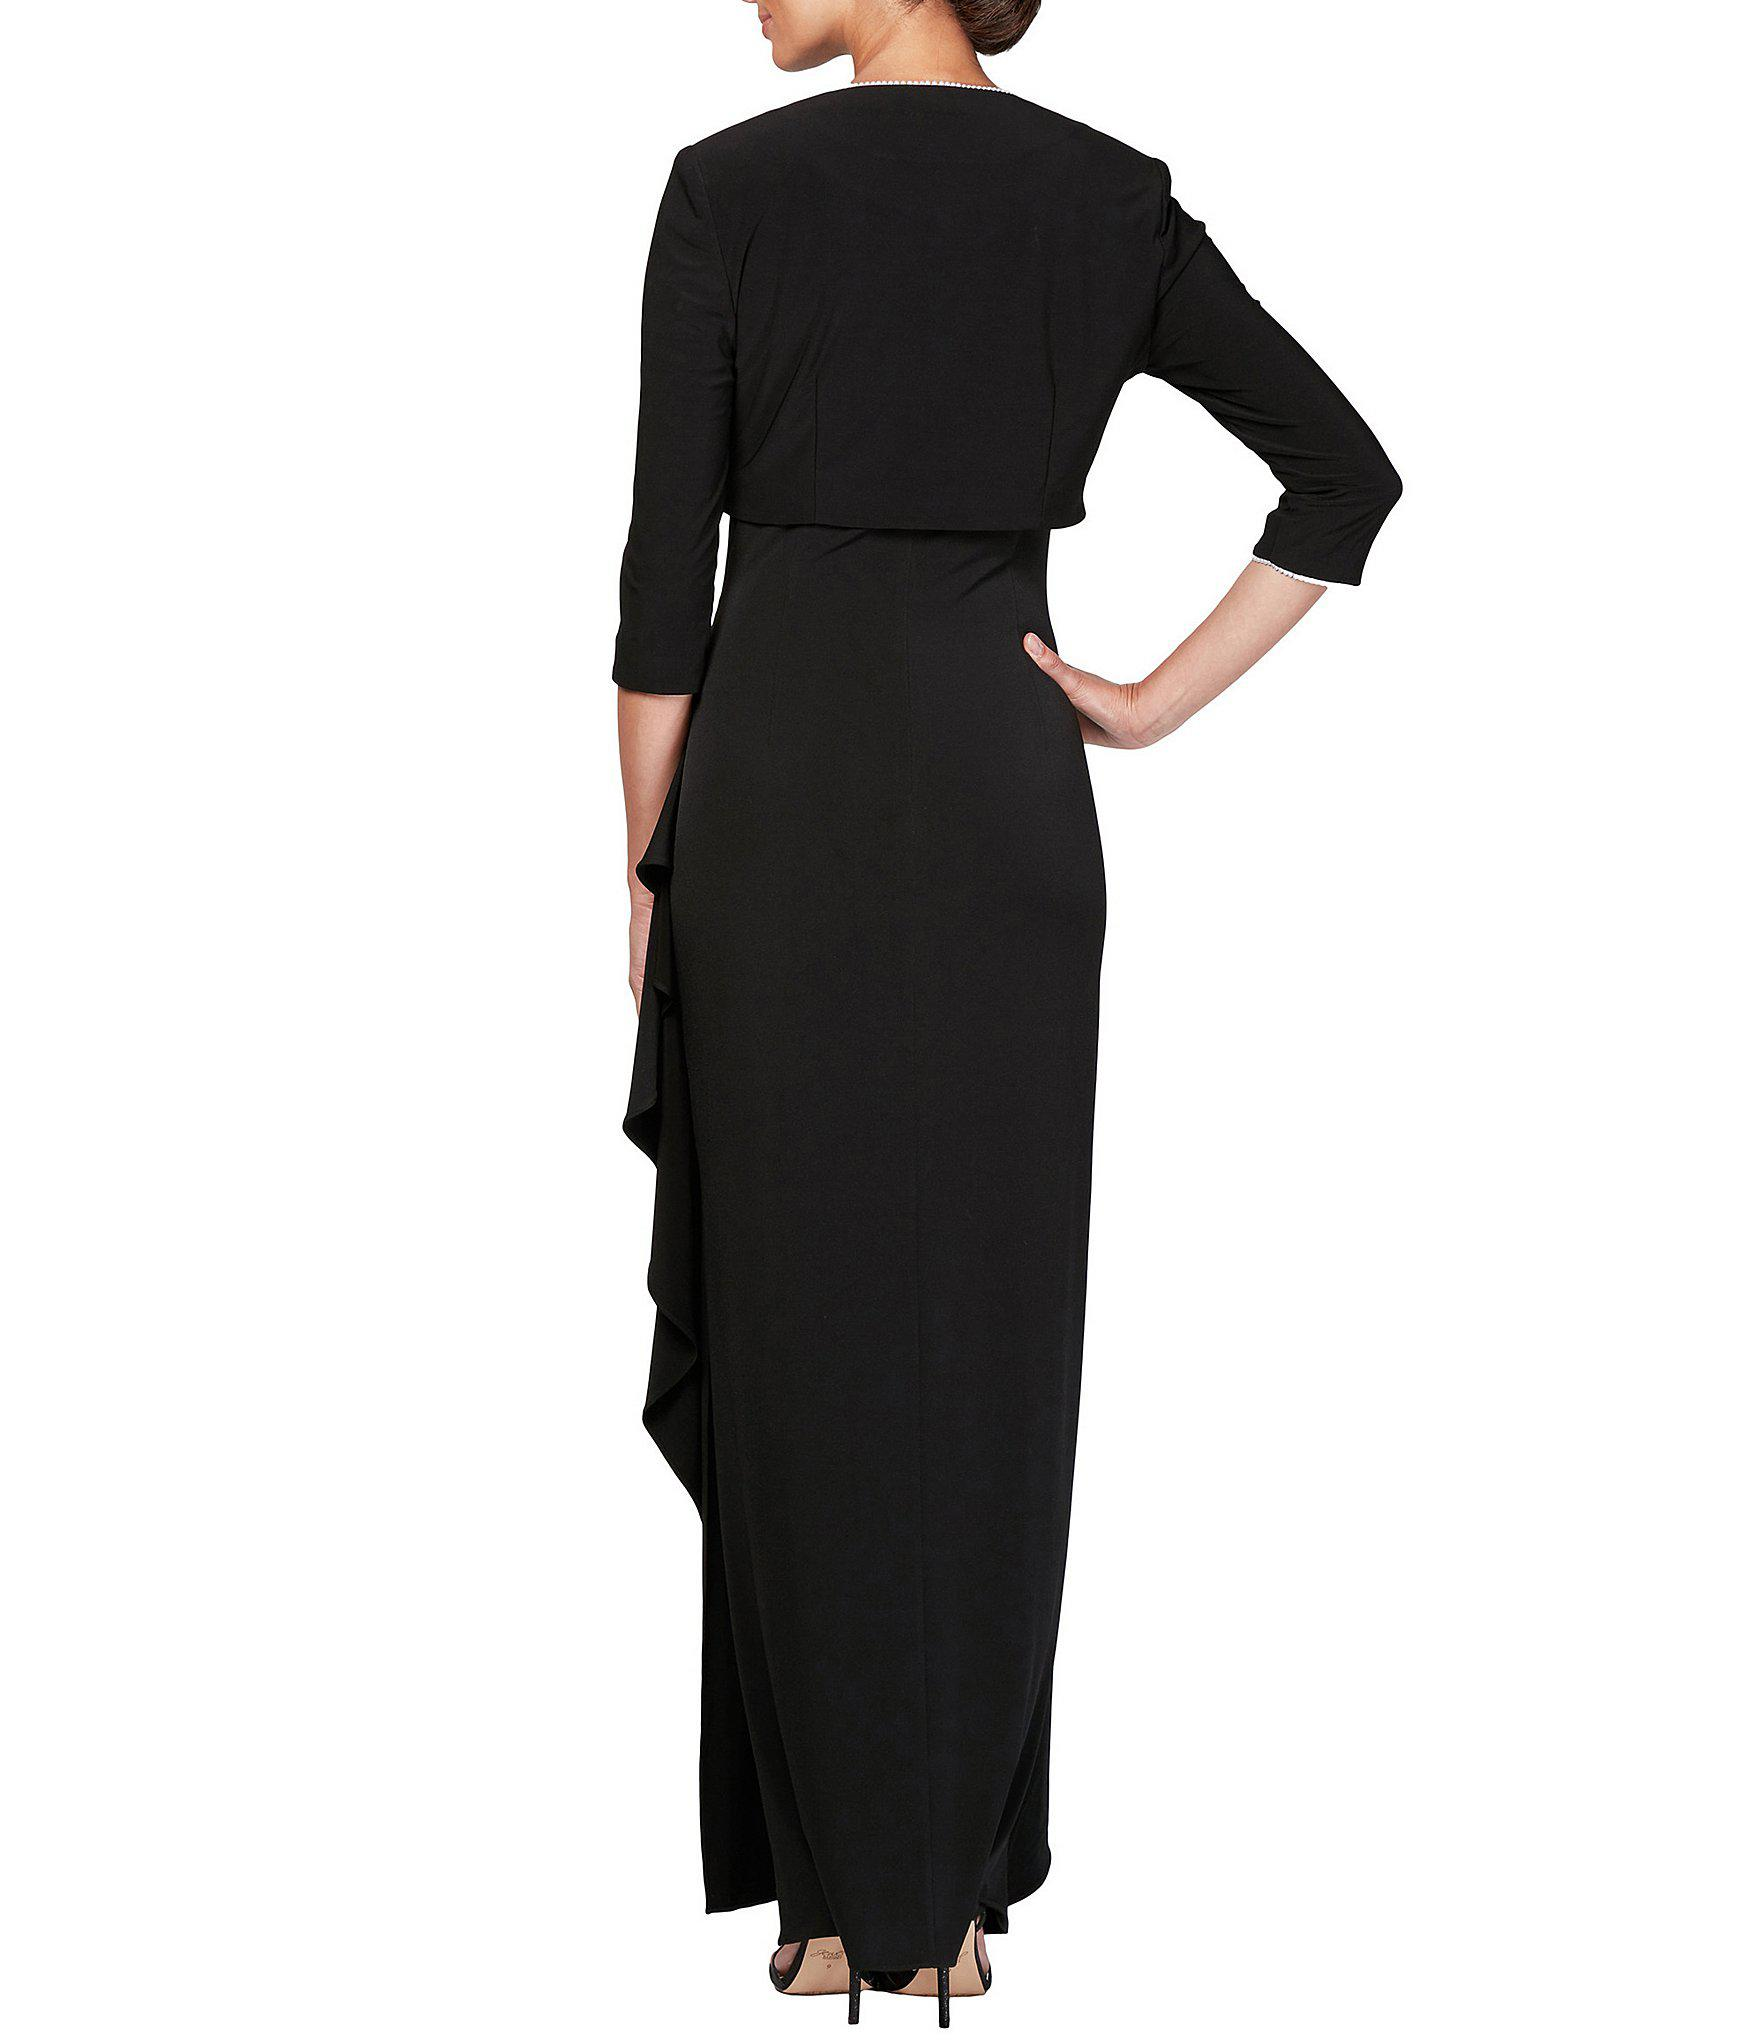 8f4457c777 Petite Evening Dresses Dillards - Data Dynamic AG